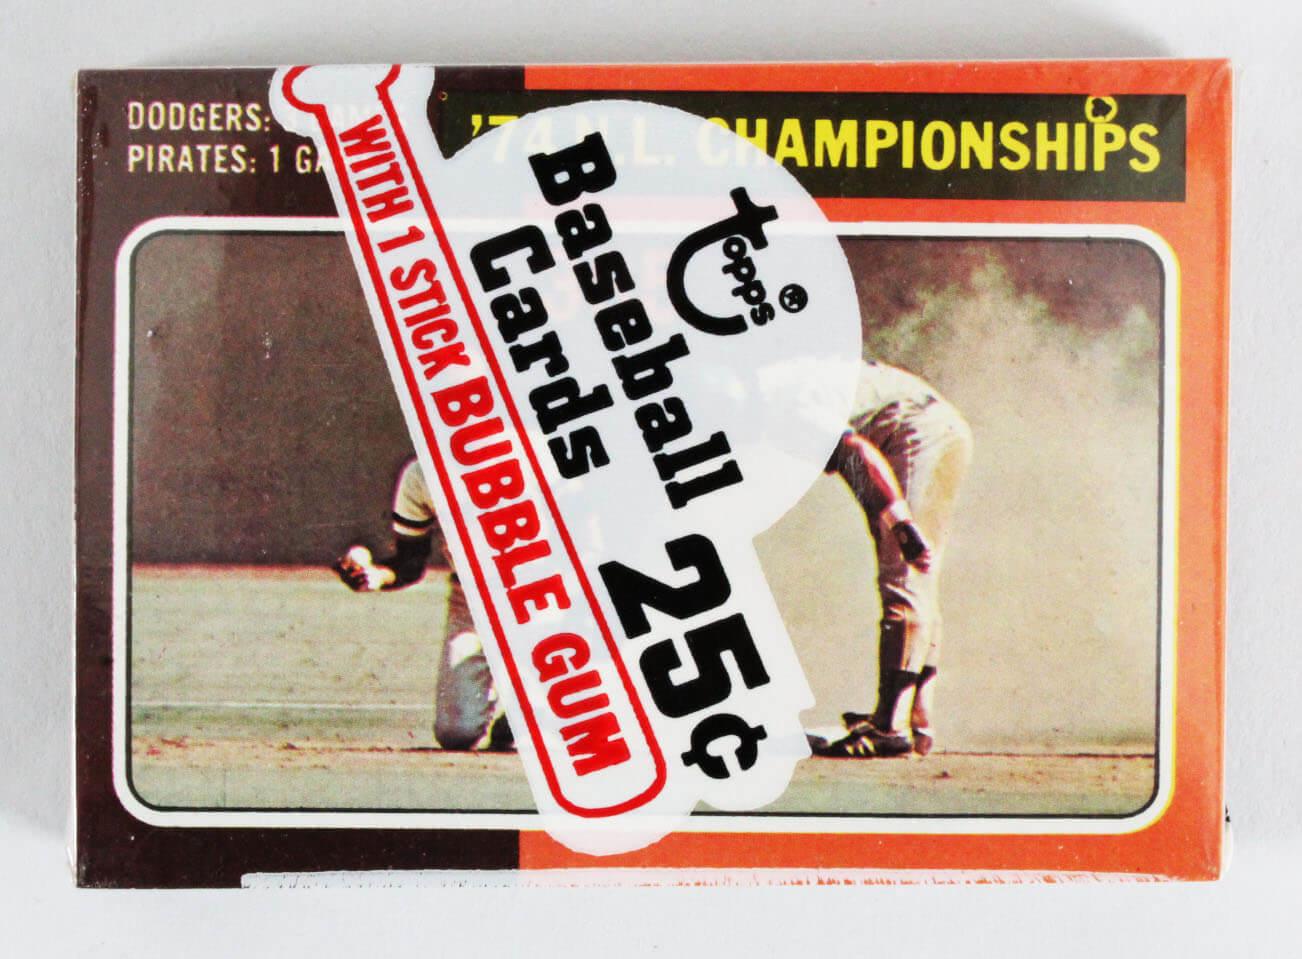 1975 Topps Mini Cello Pack w/ Stars incl. Mickey Lolich, Dodgers & Pirates etc.